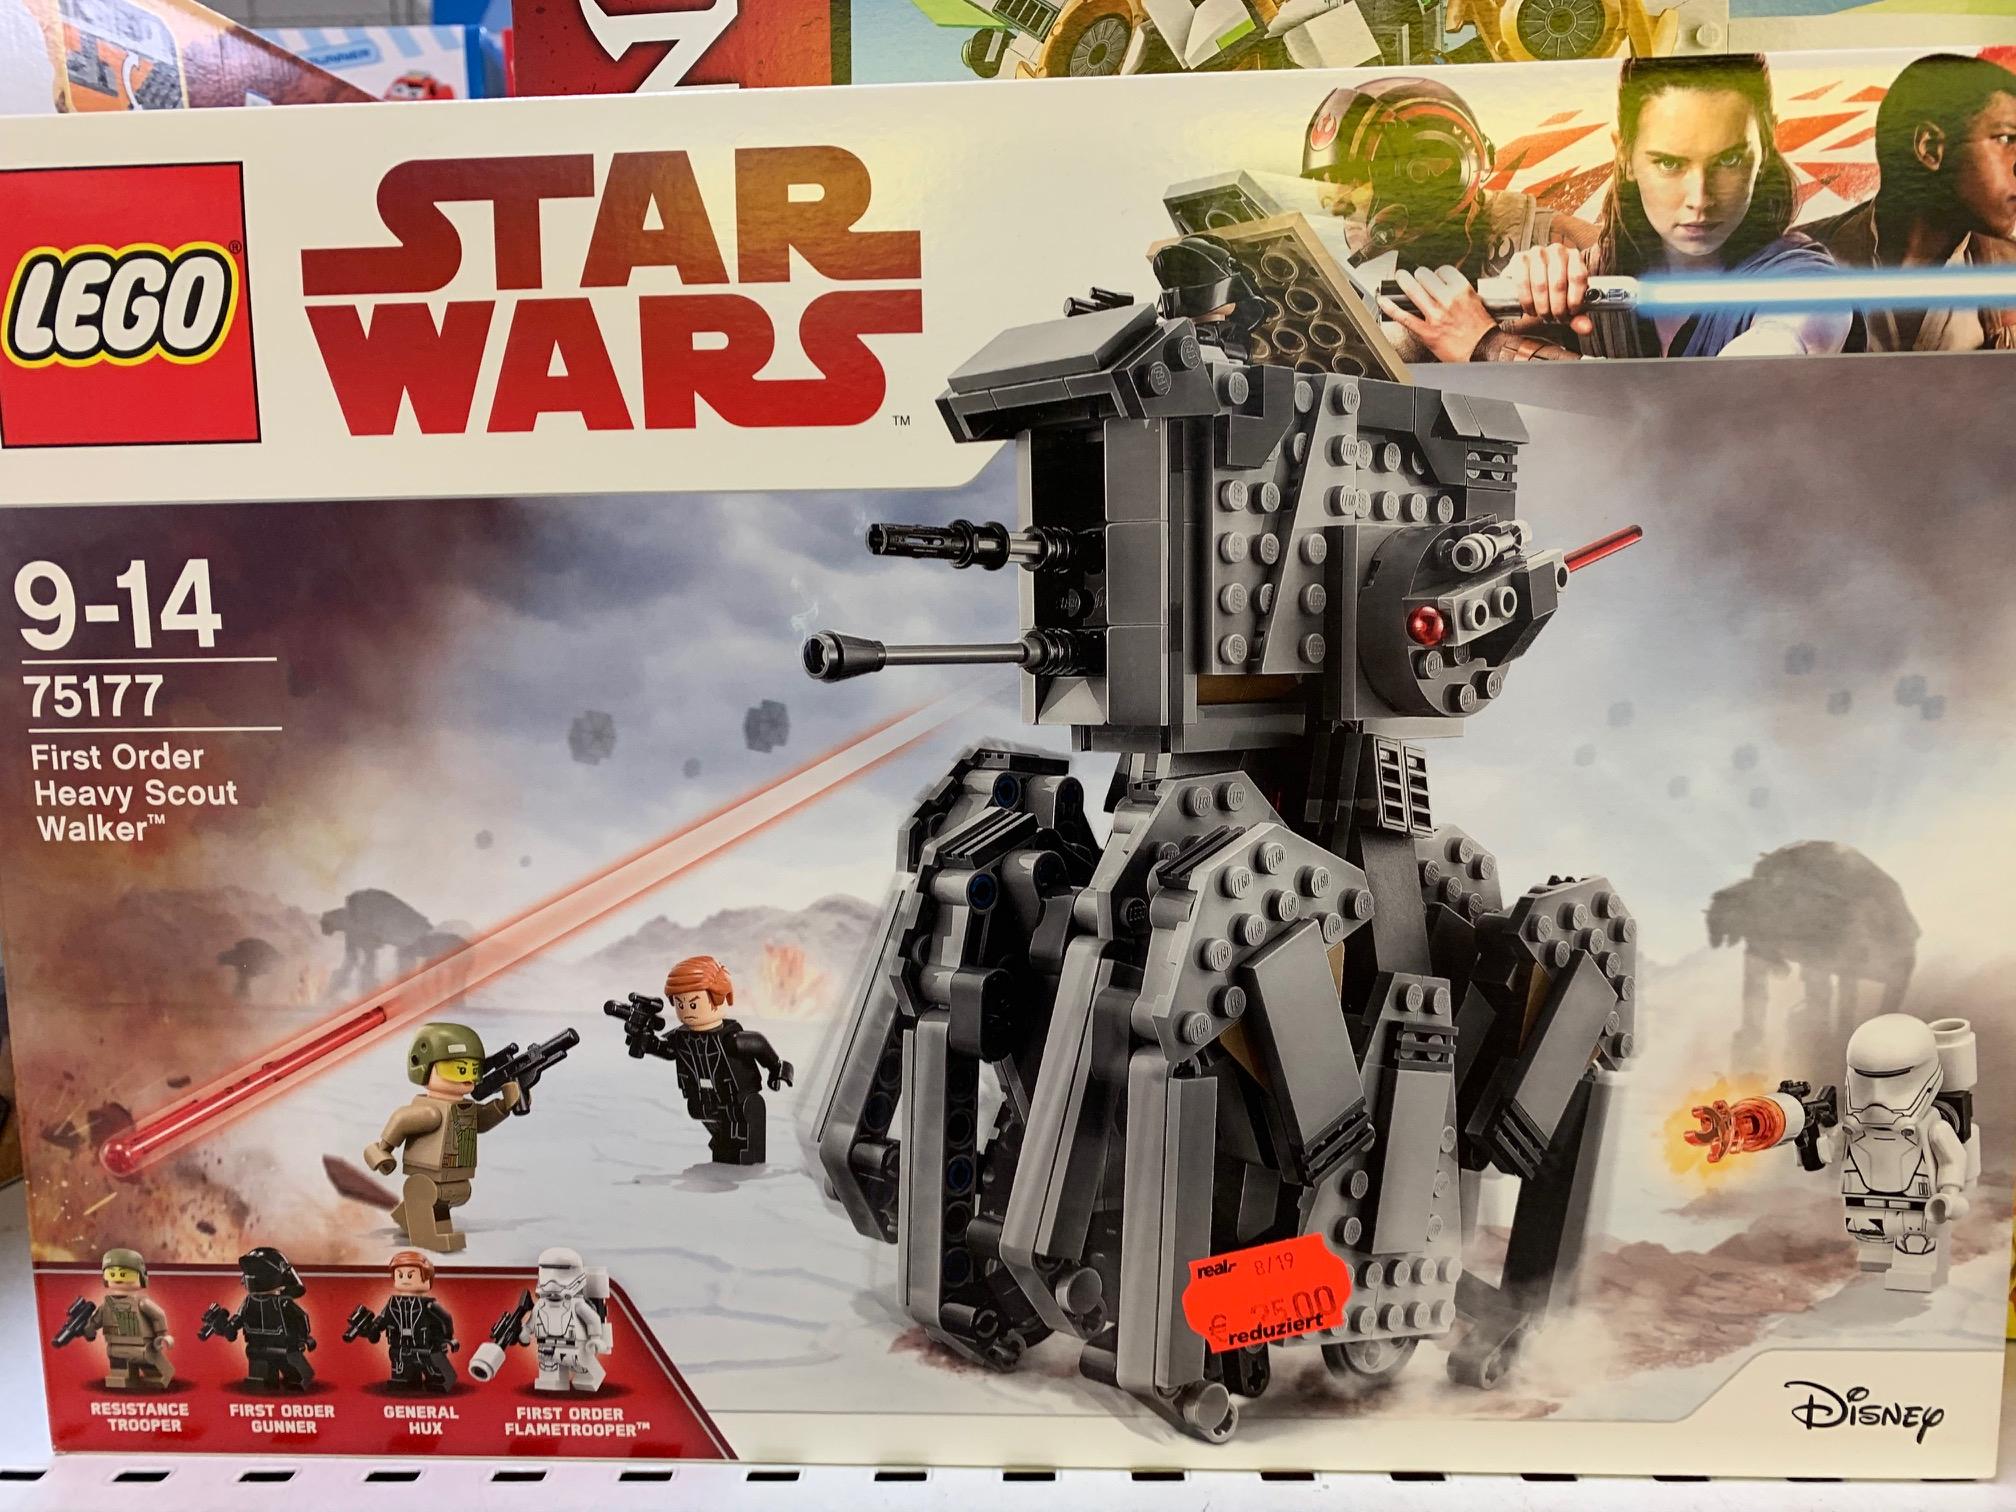 [Lokal] Real Alzey - LEGO Star Wars 75177 First Order Heavy Scout Walker